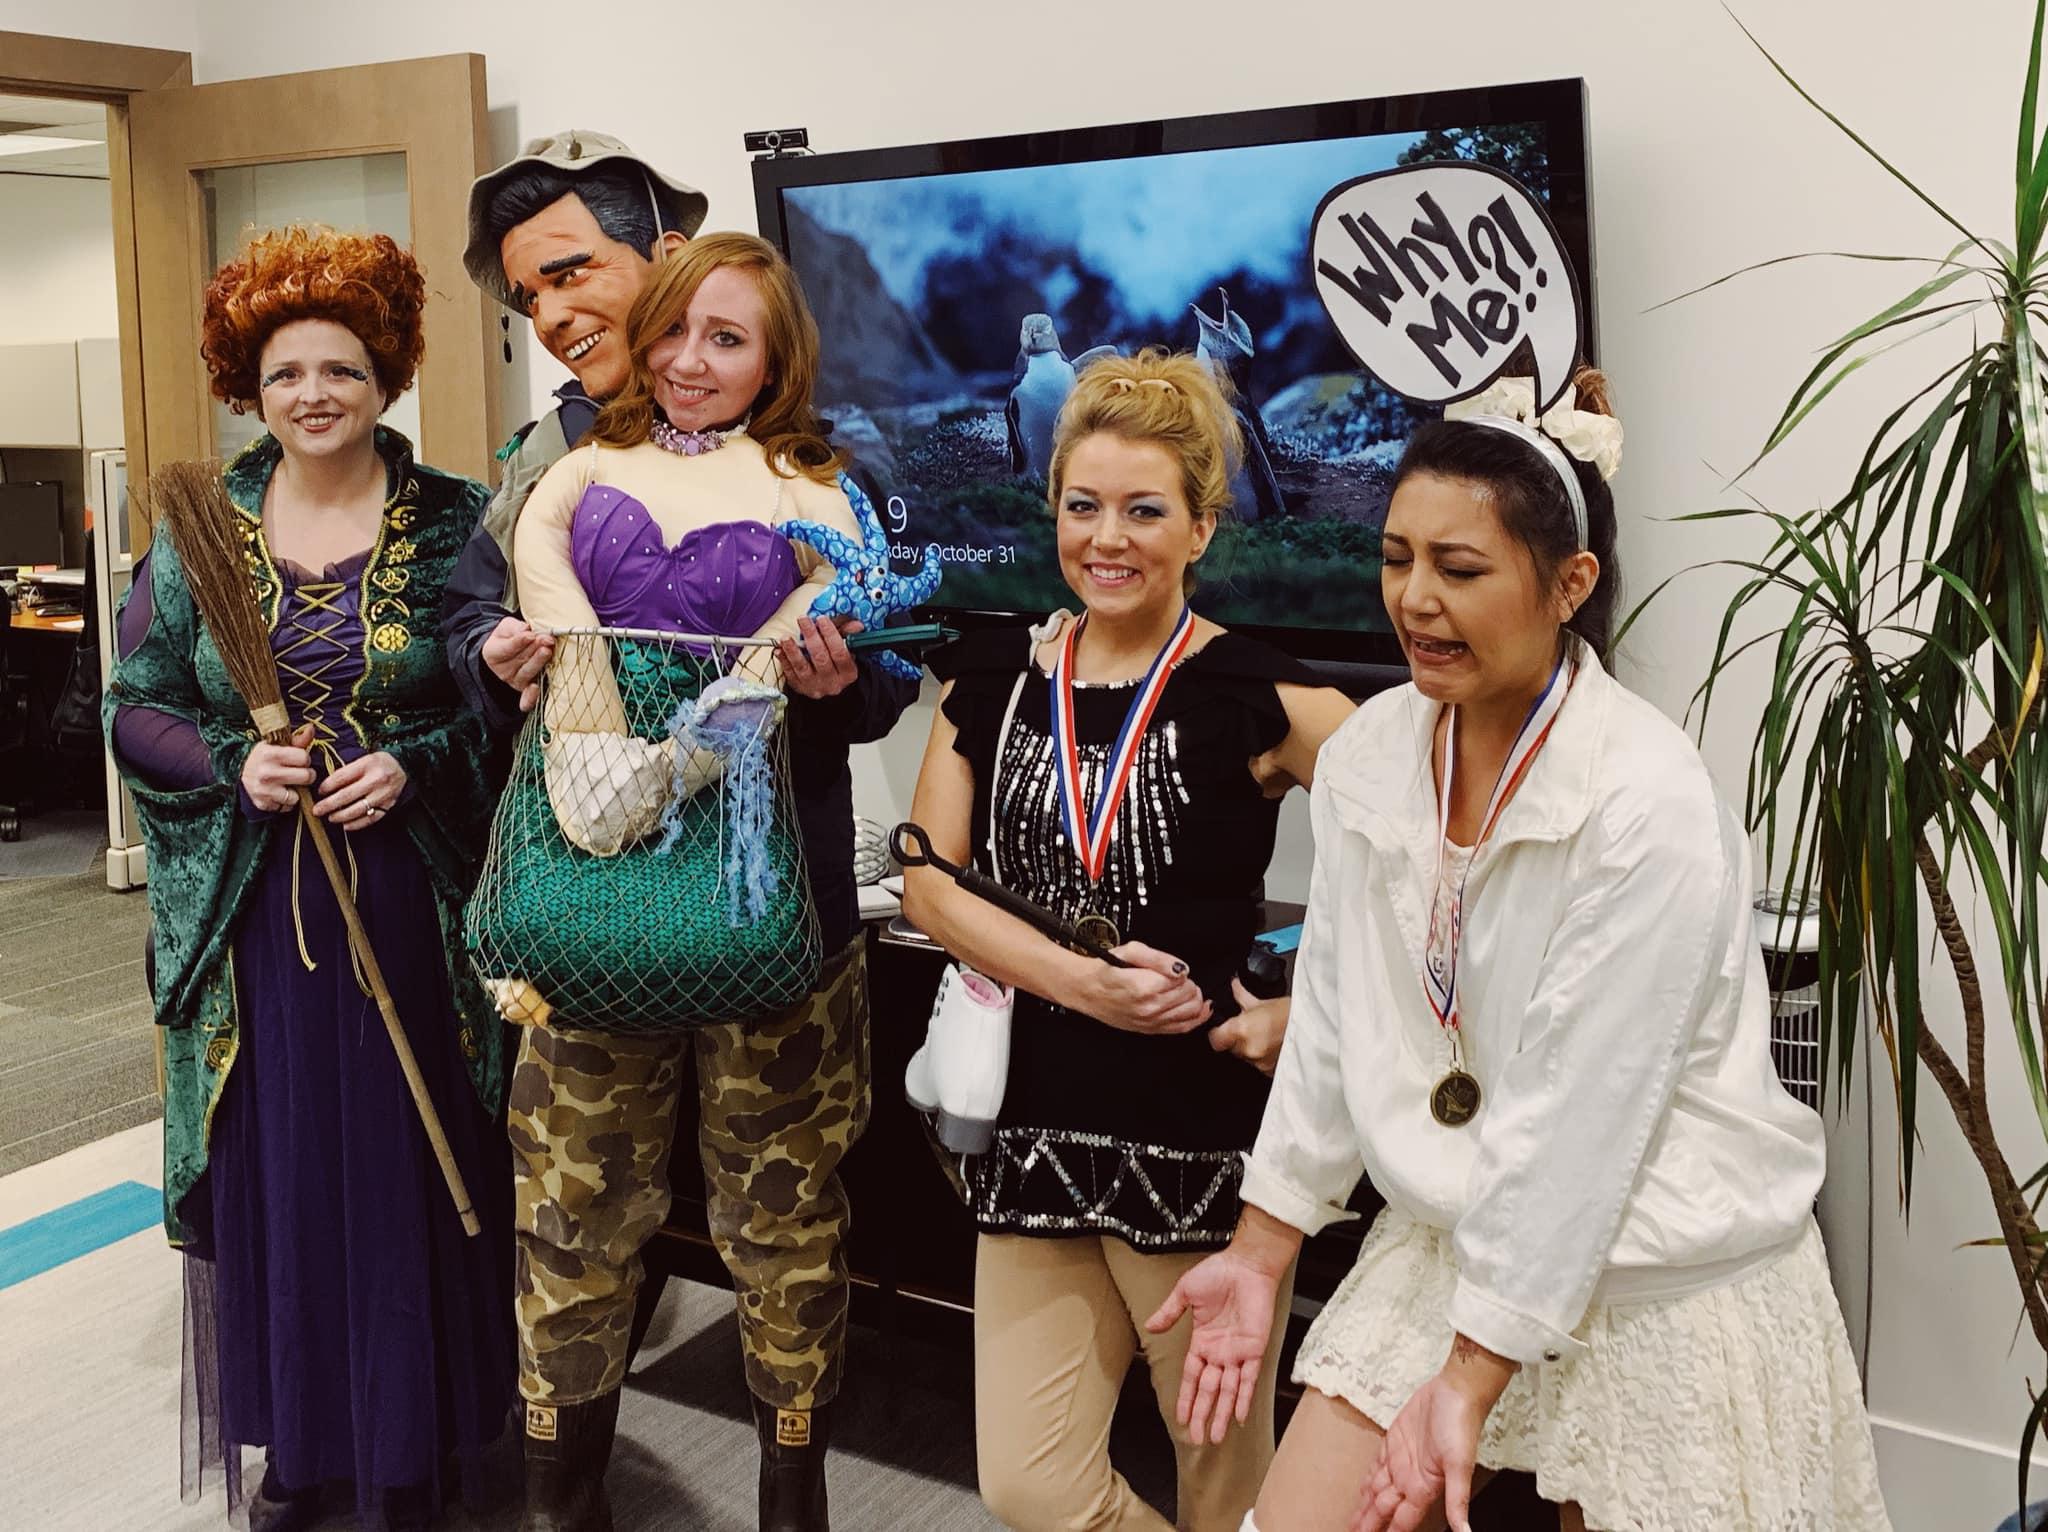 Shelley, Jenn, Sarah, & Danielle - Costume Contest finalists